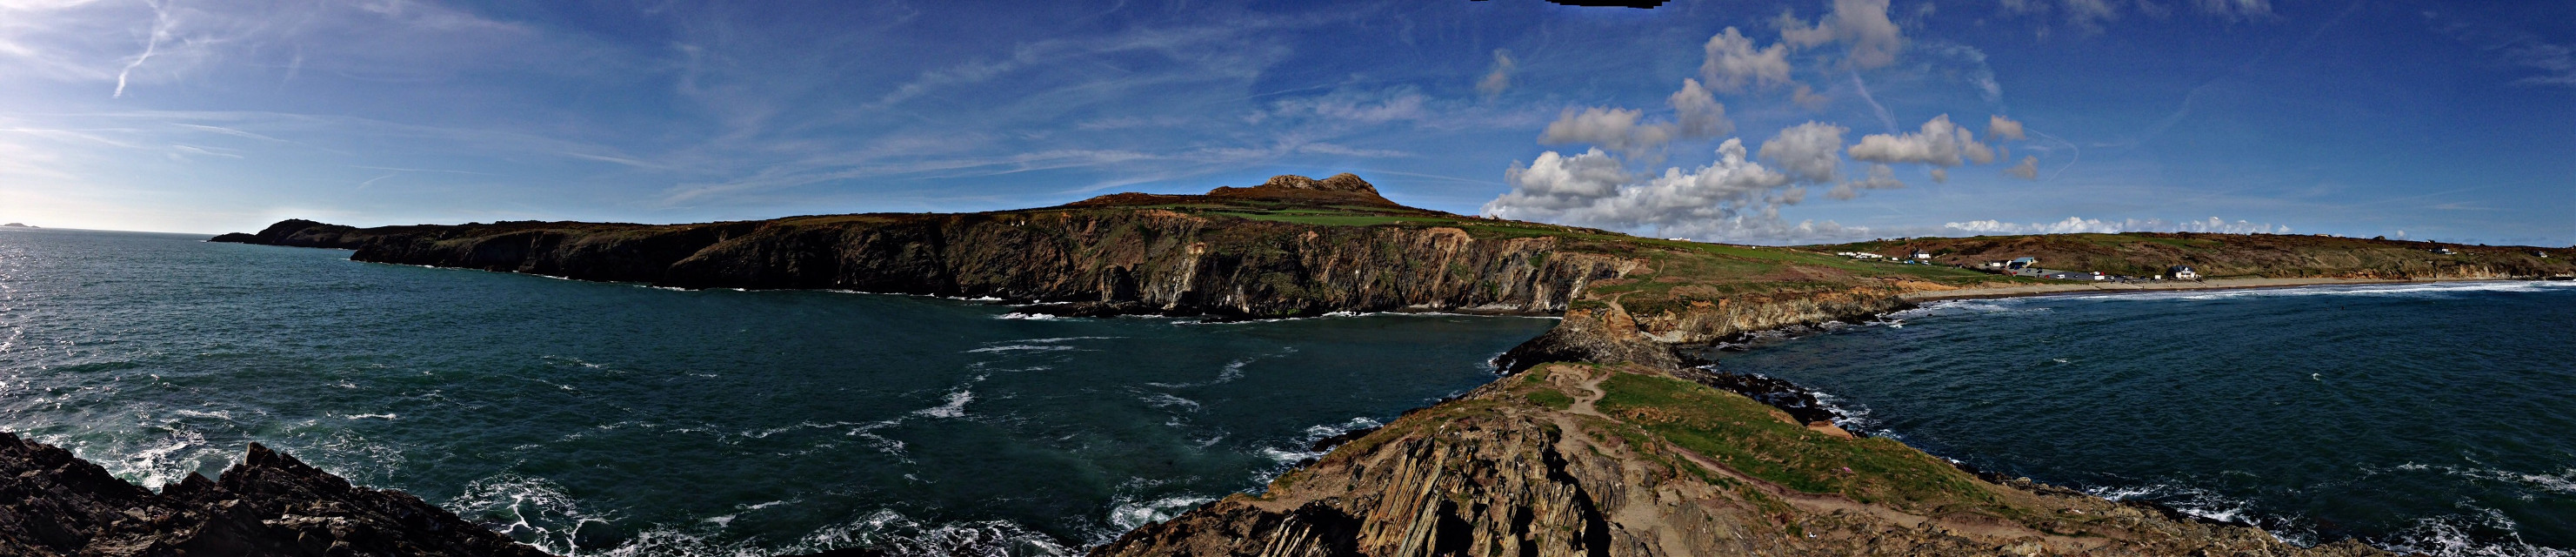 most beautiful coastal path in Uk Welsh coastal path @St Davids